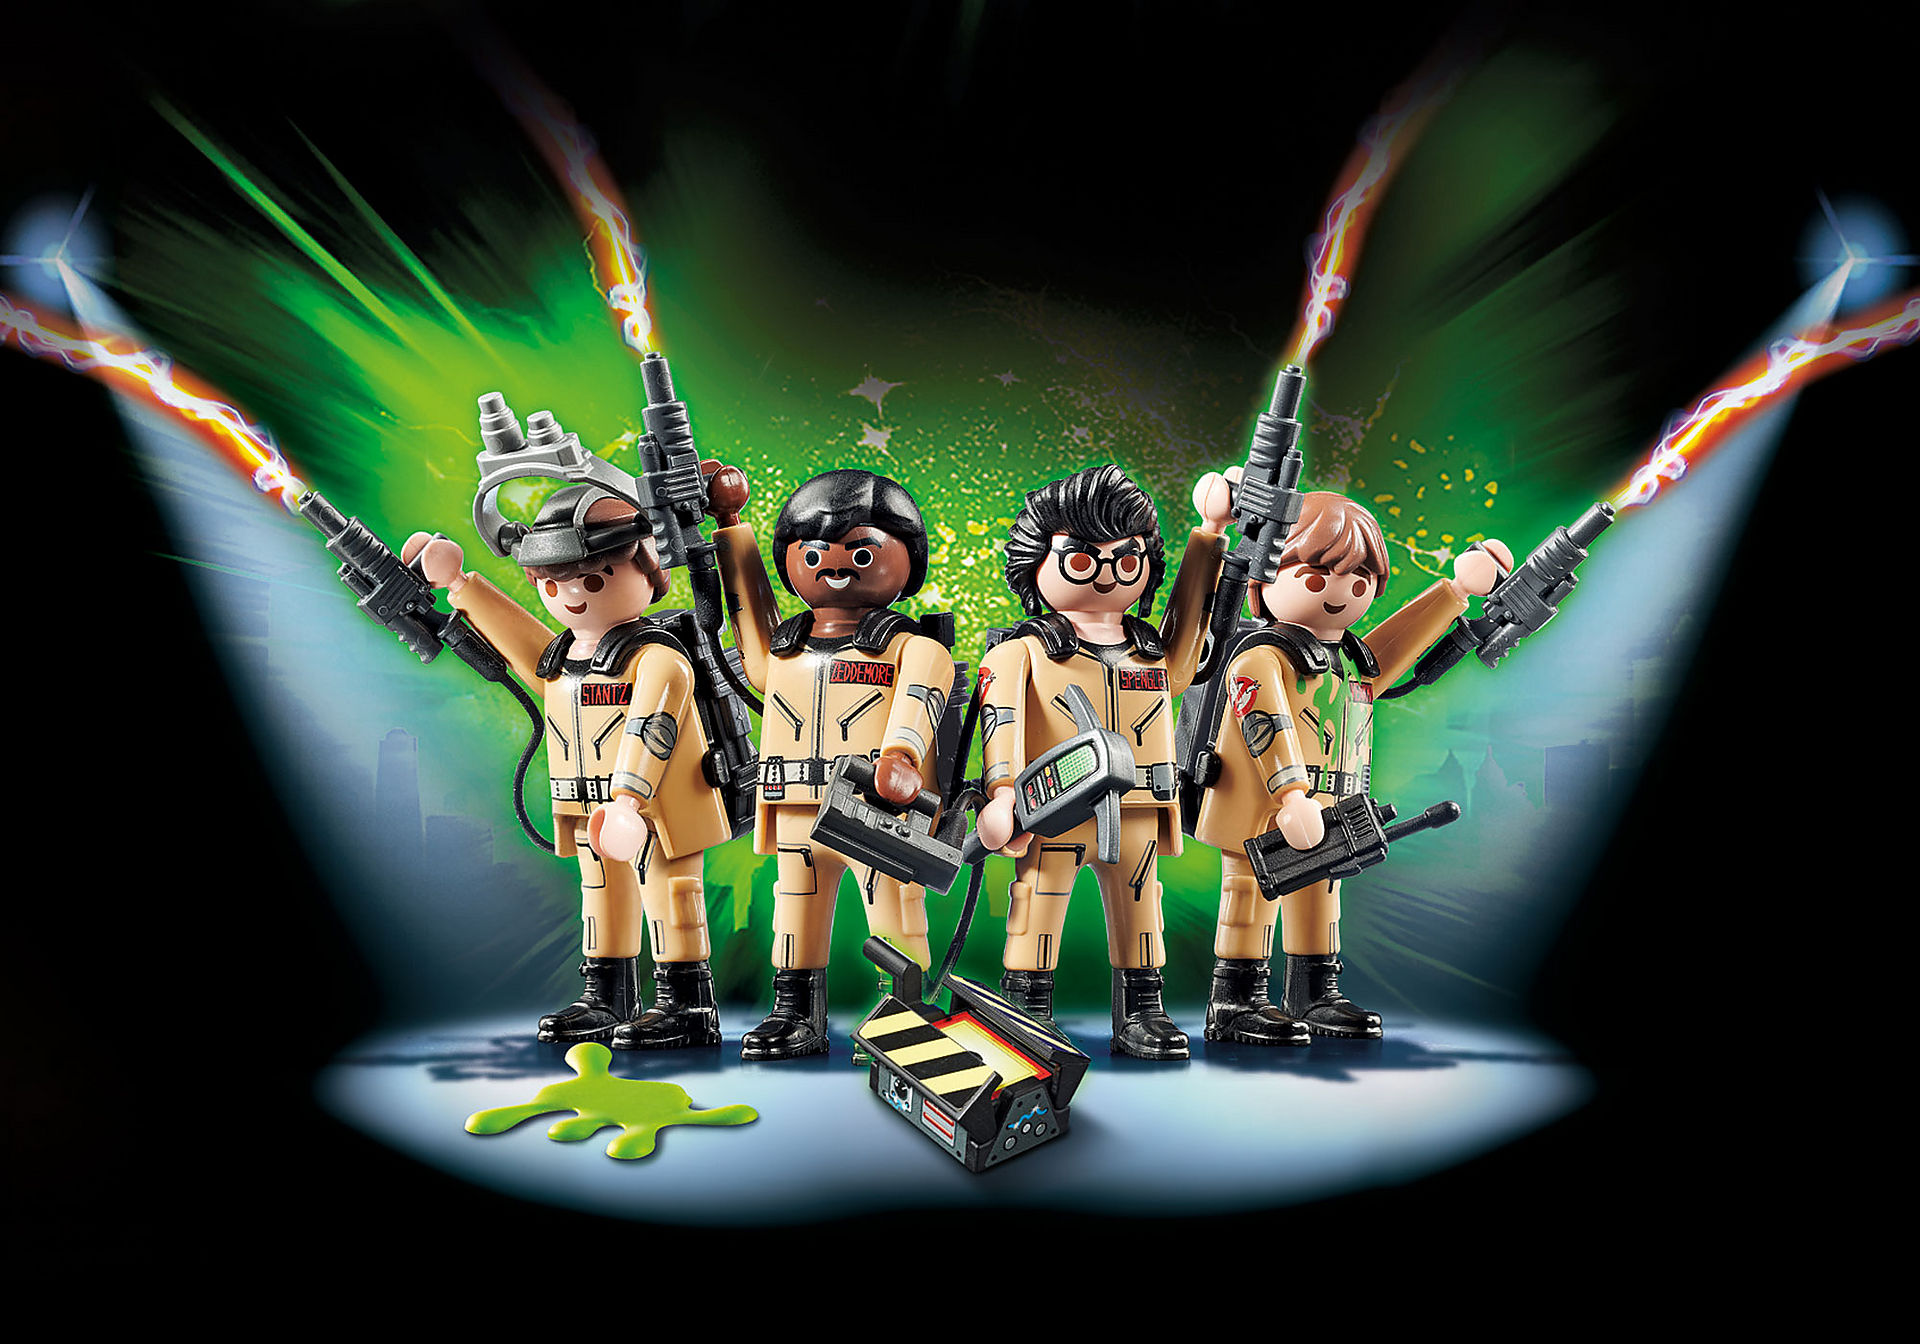 70175 Ghostbusters™ Figurenset Ghostbusters zoom image1